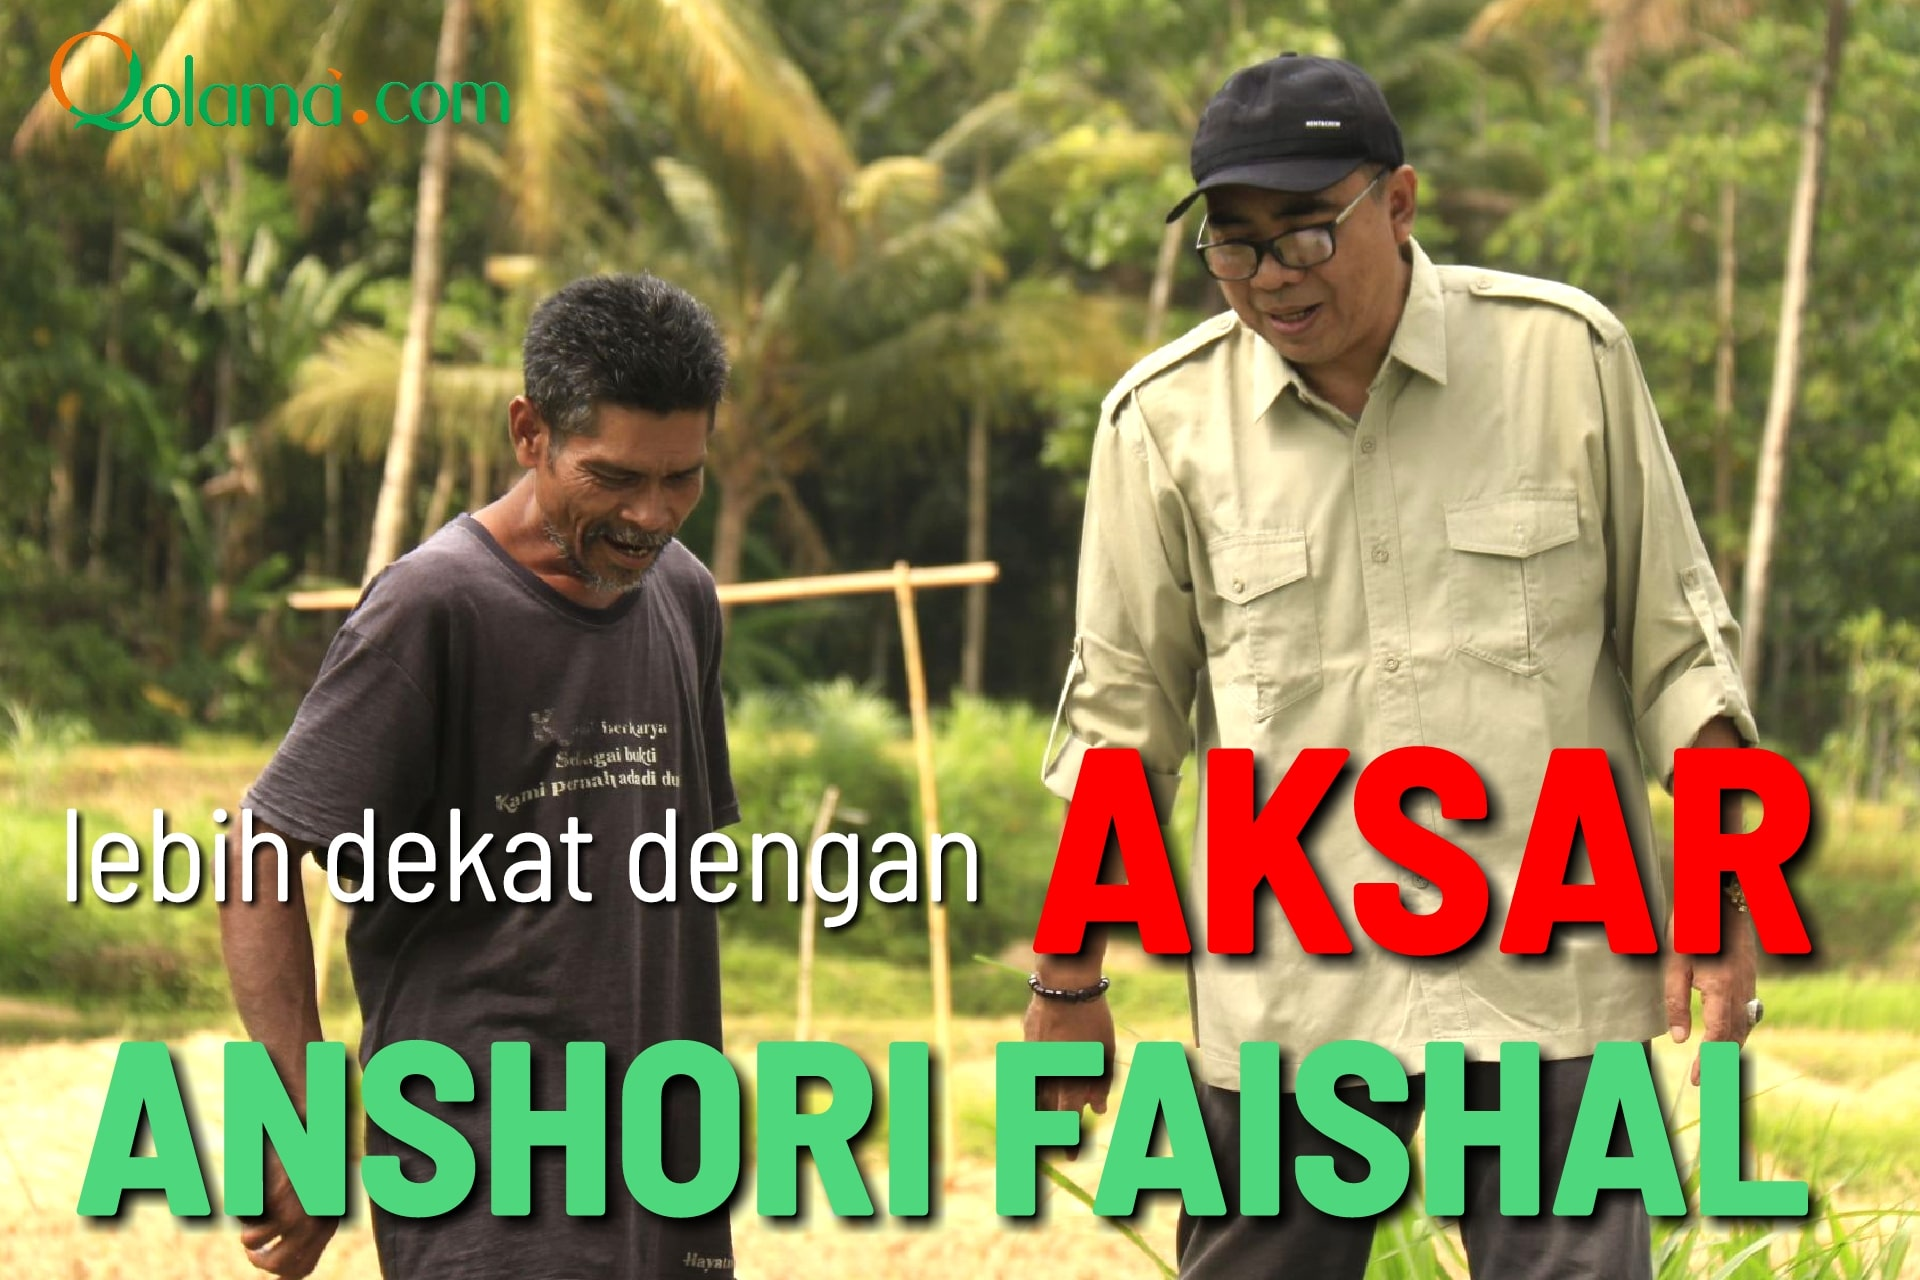 lebih-dekat-dengan-Aksar-anshari-faishal